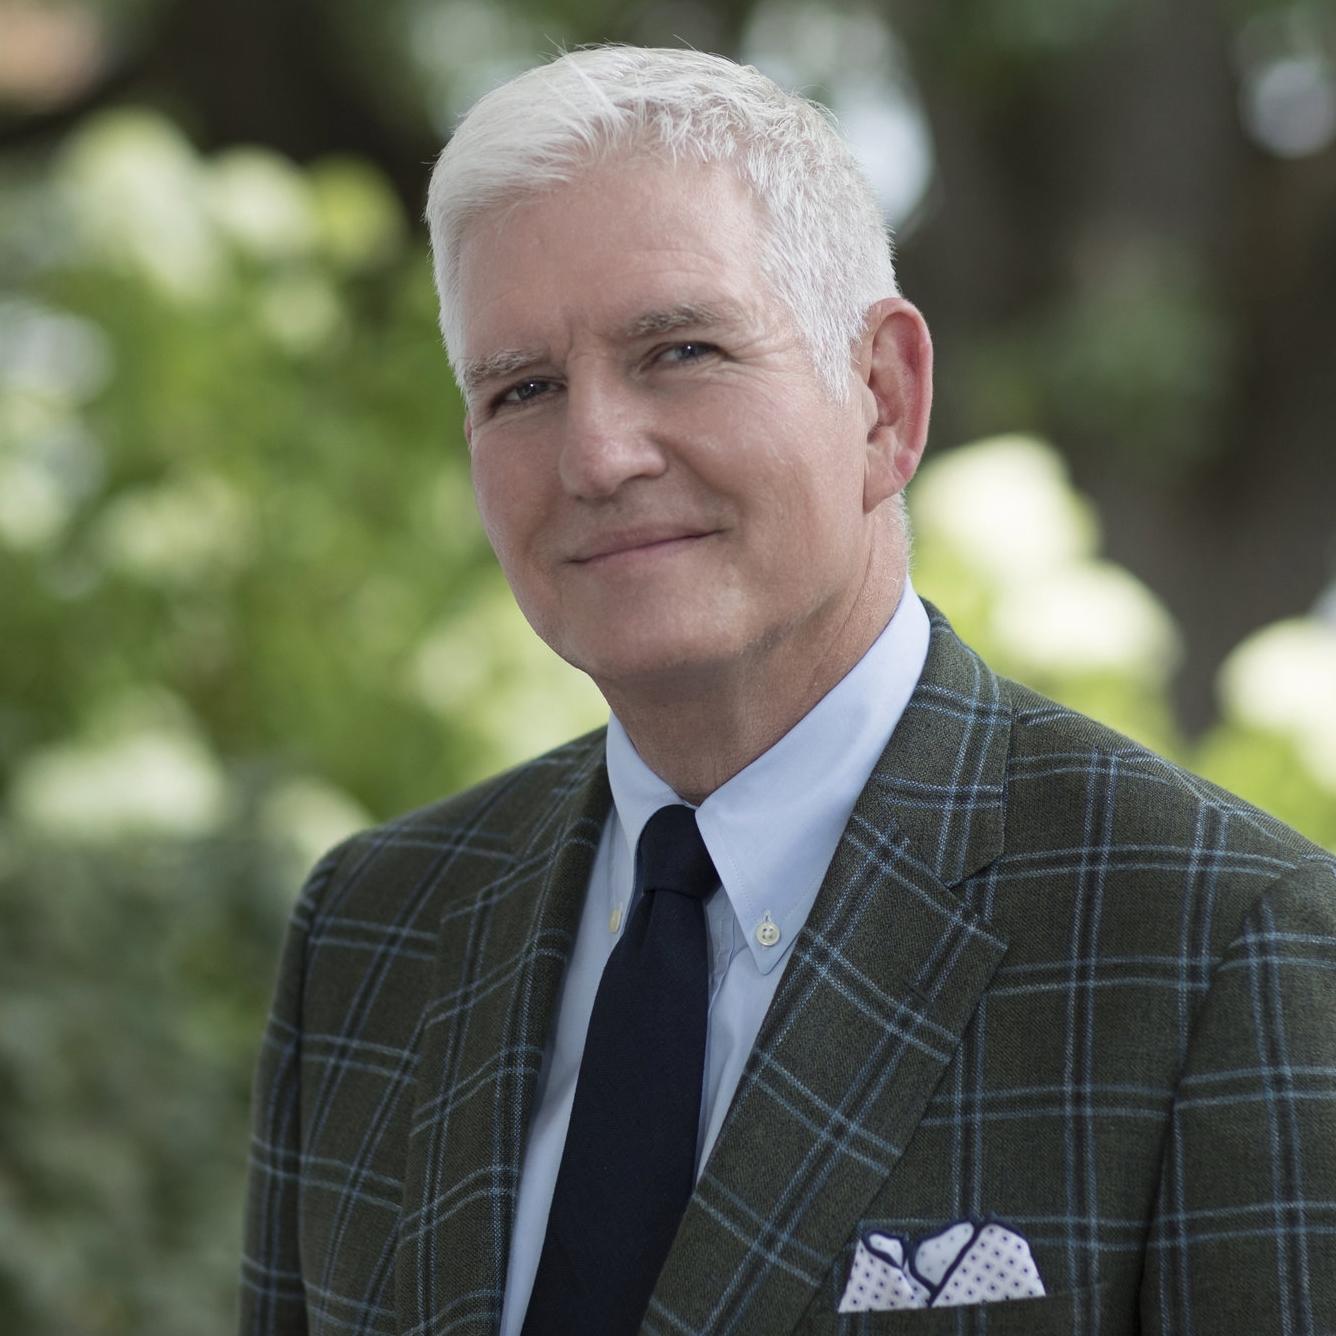 Allen Groves - Dean of Students, University of Virginia